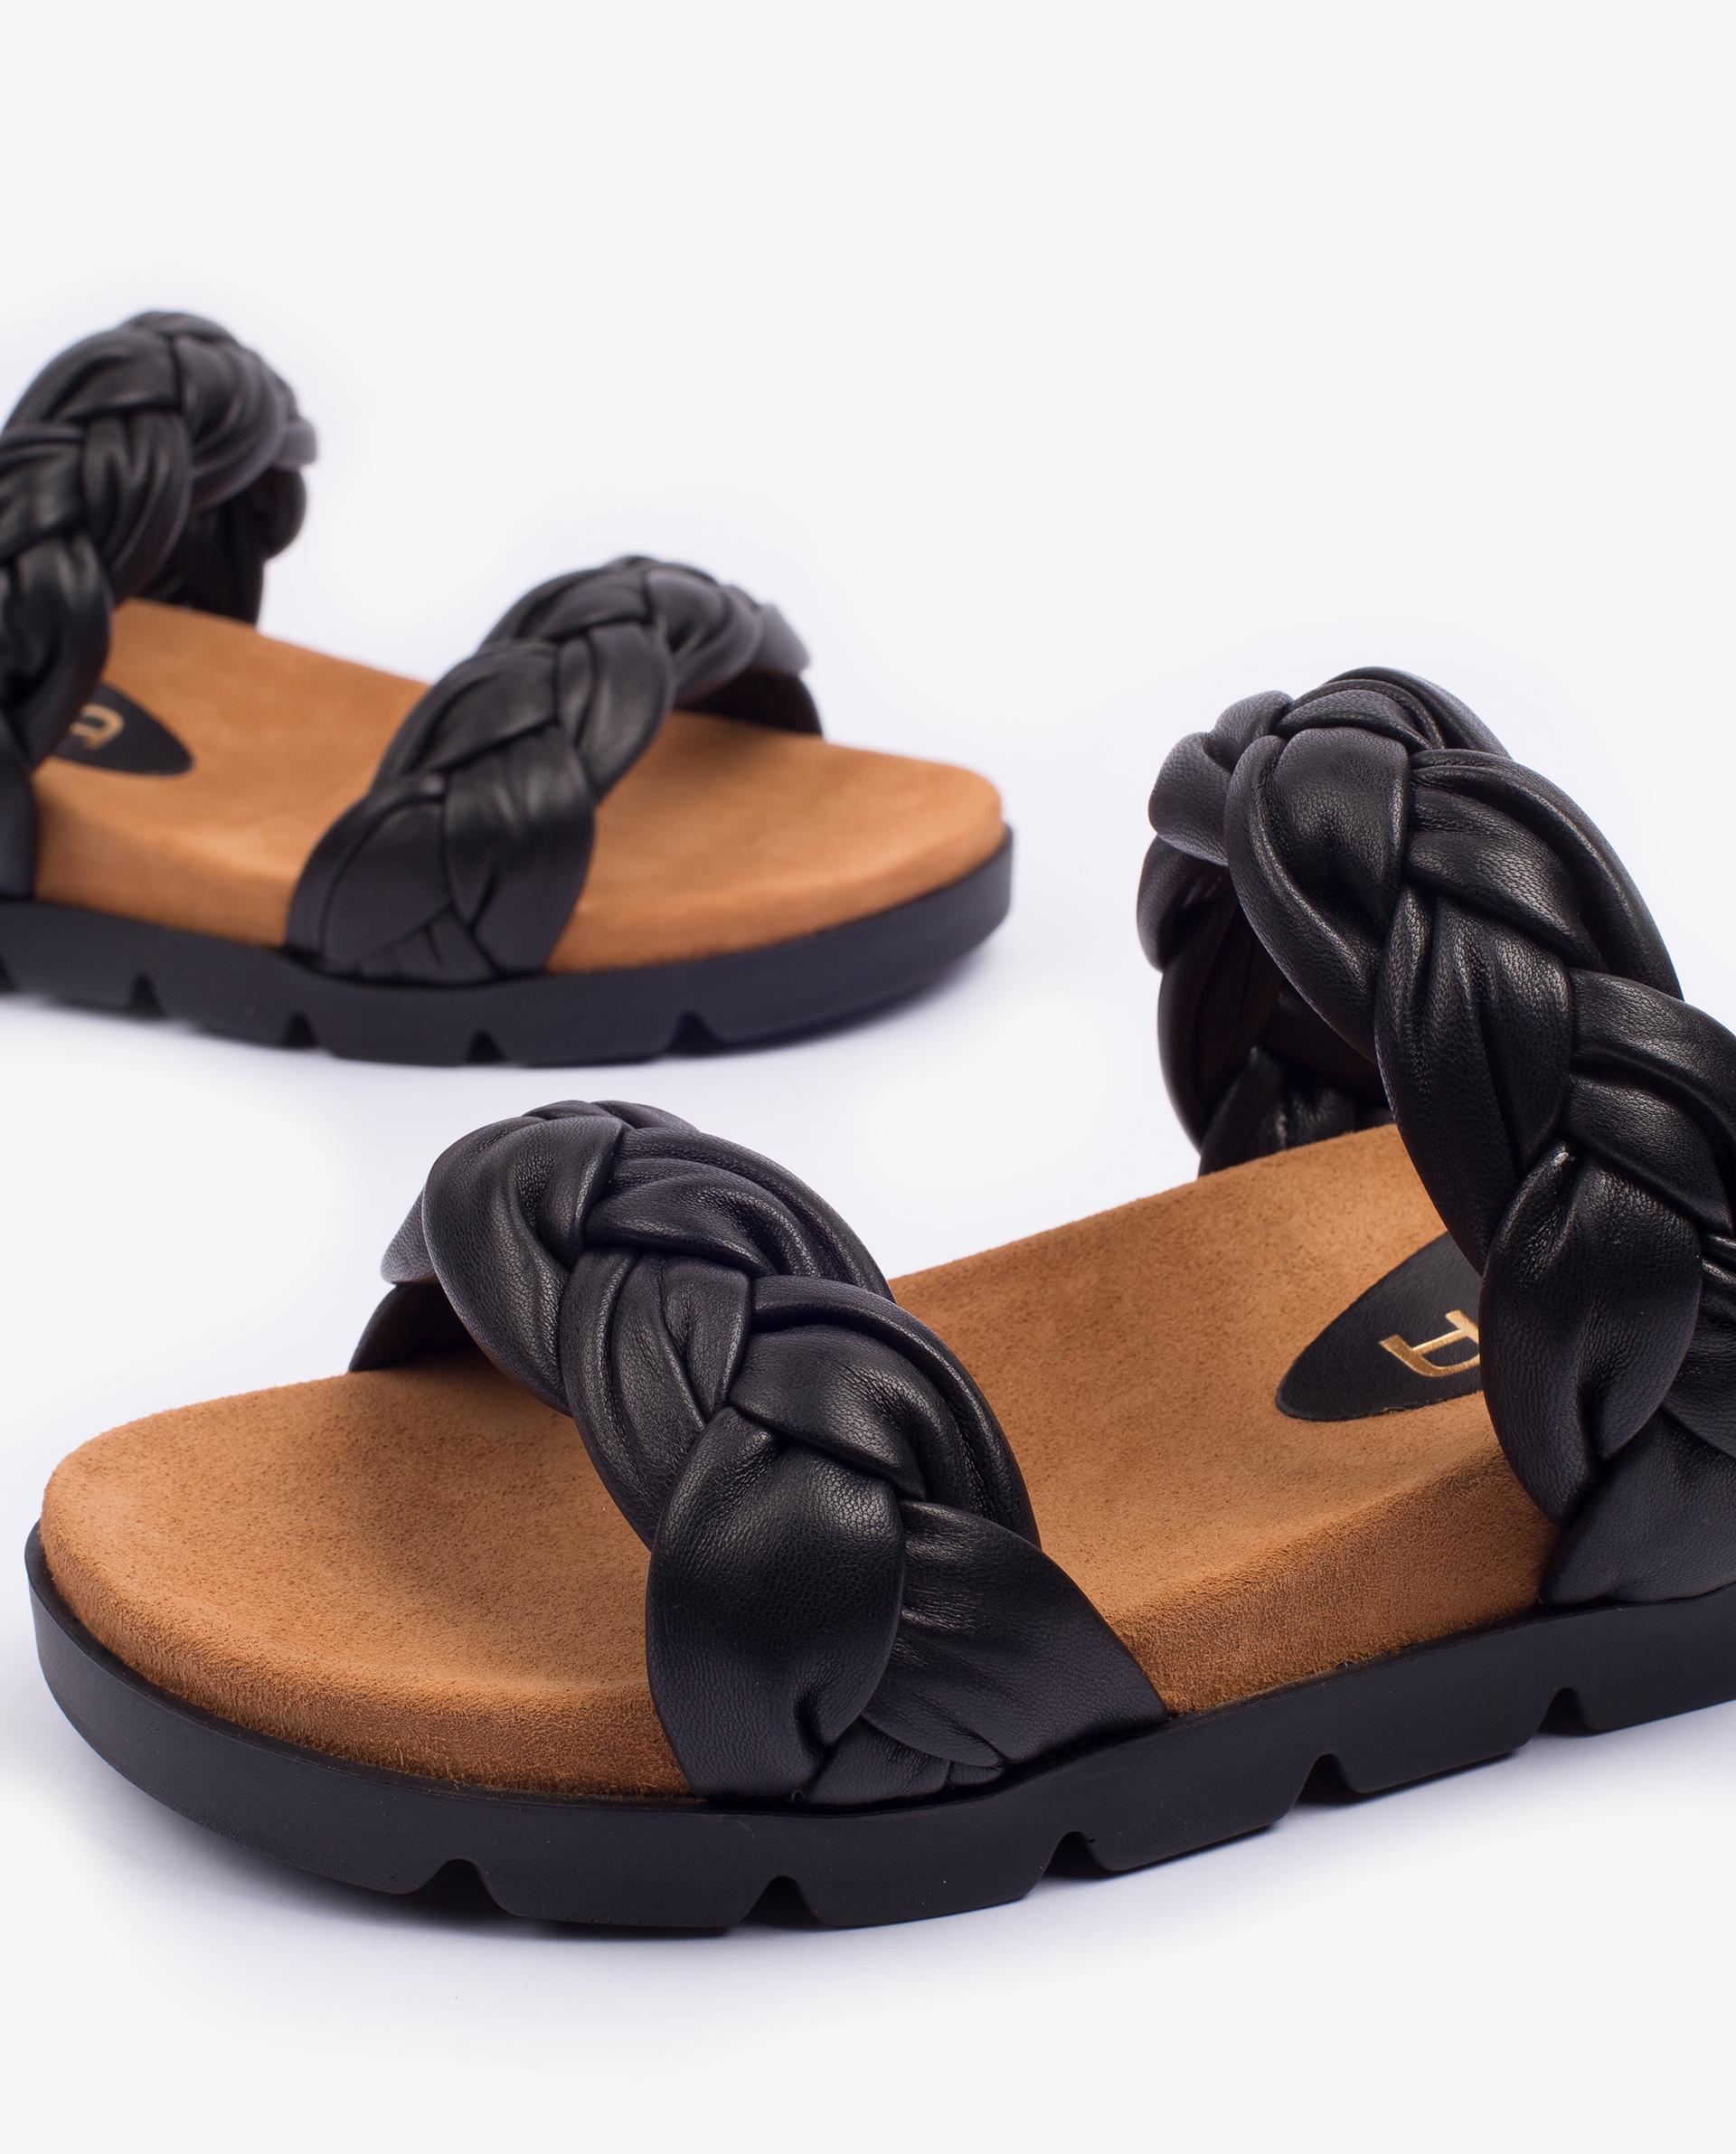 UNISA Sandalia plana de piel con tiras trenzadas CAIRO_NS